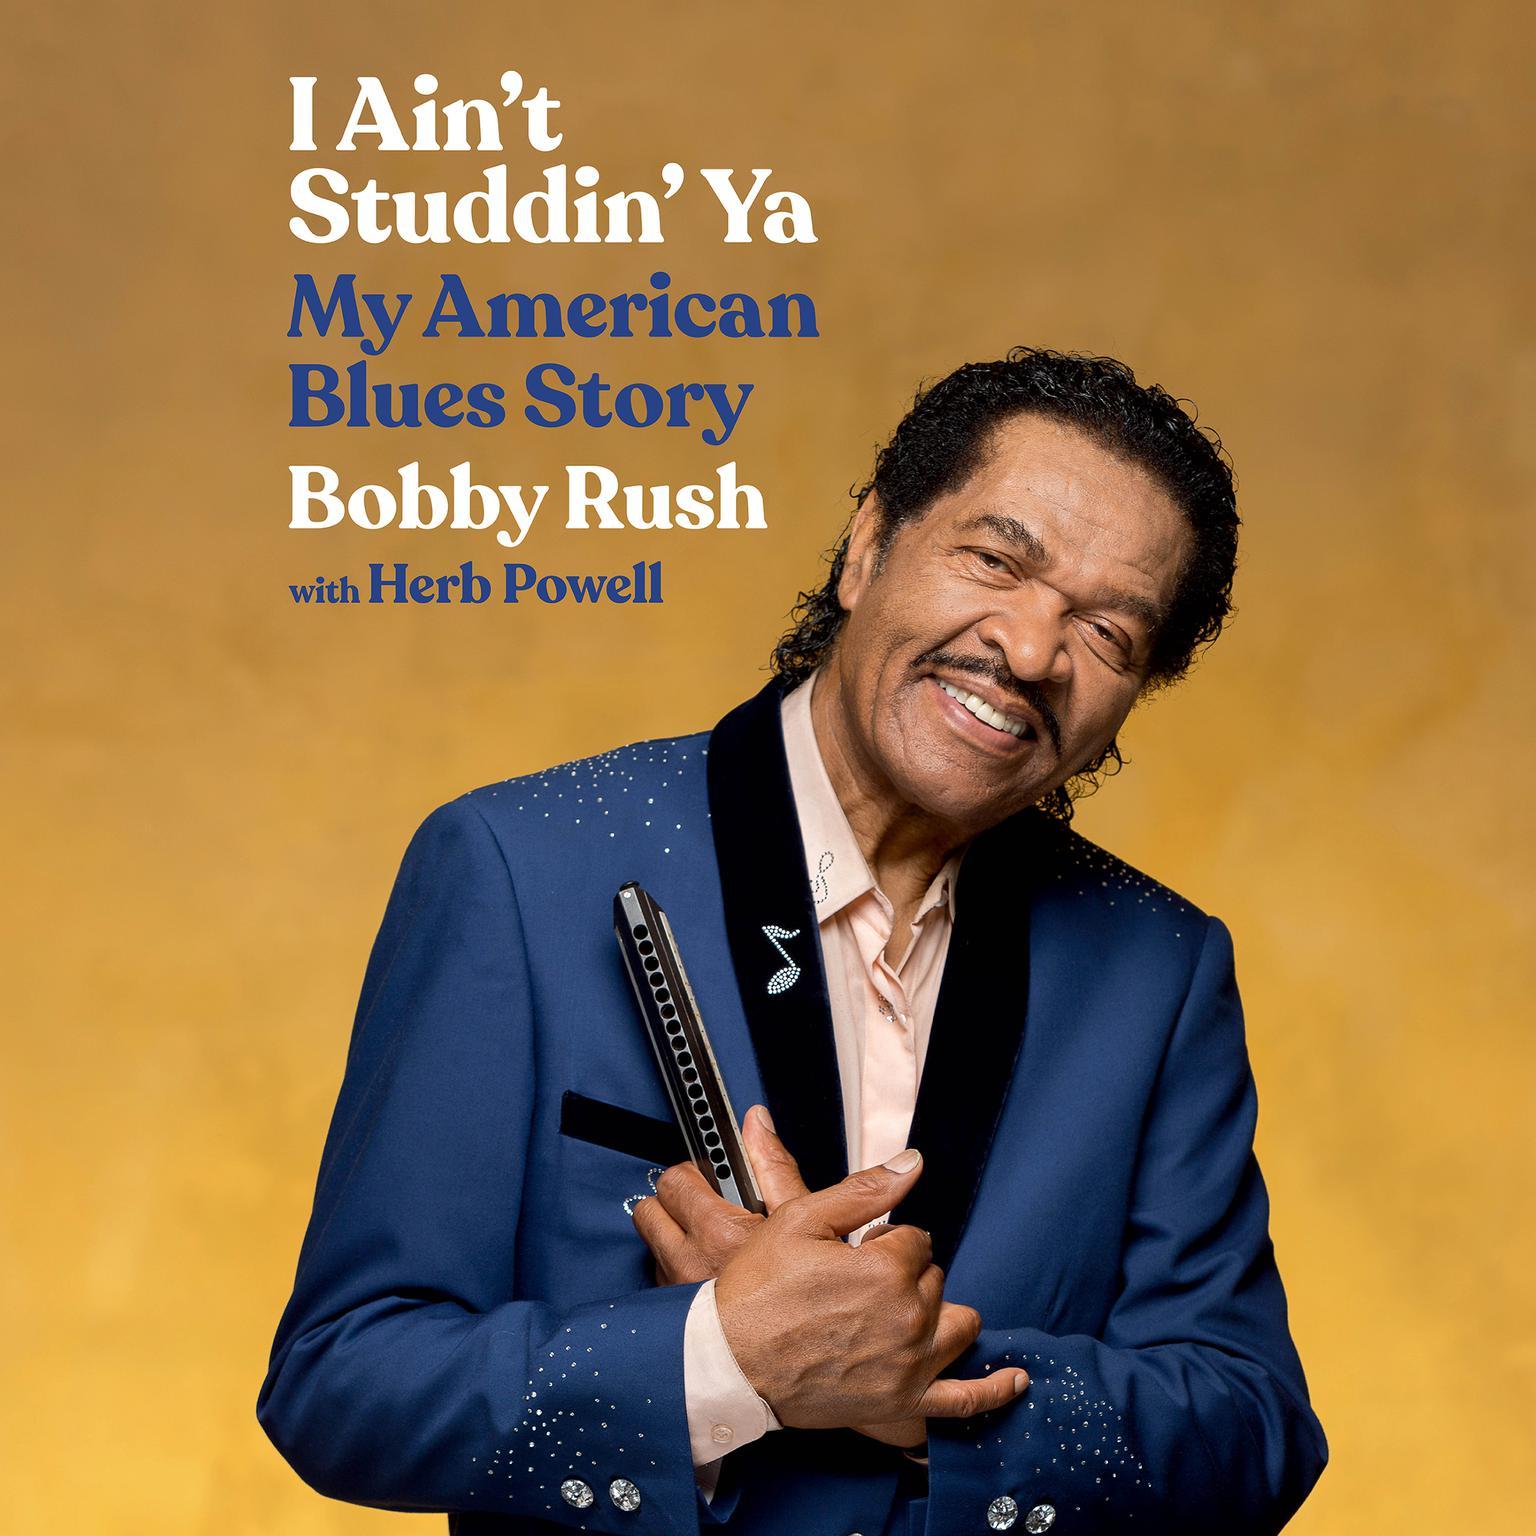 I Aint Studdin Ya: My American Blues Story Audiobook, by Bobby Rush